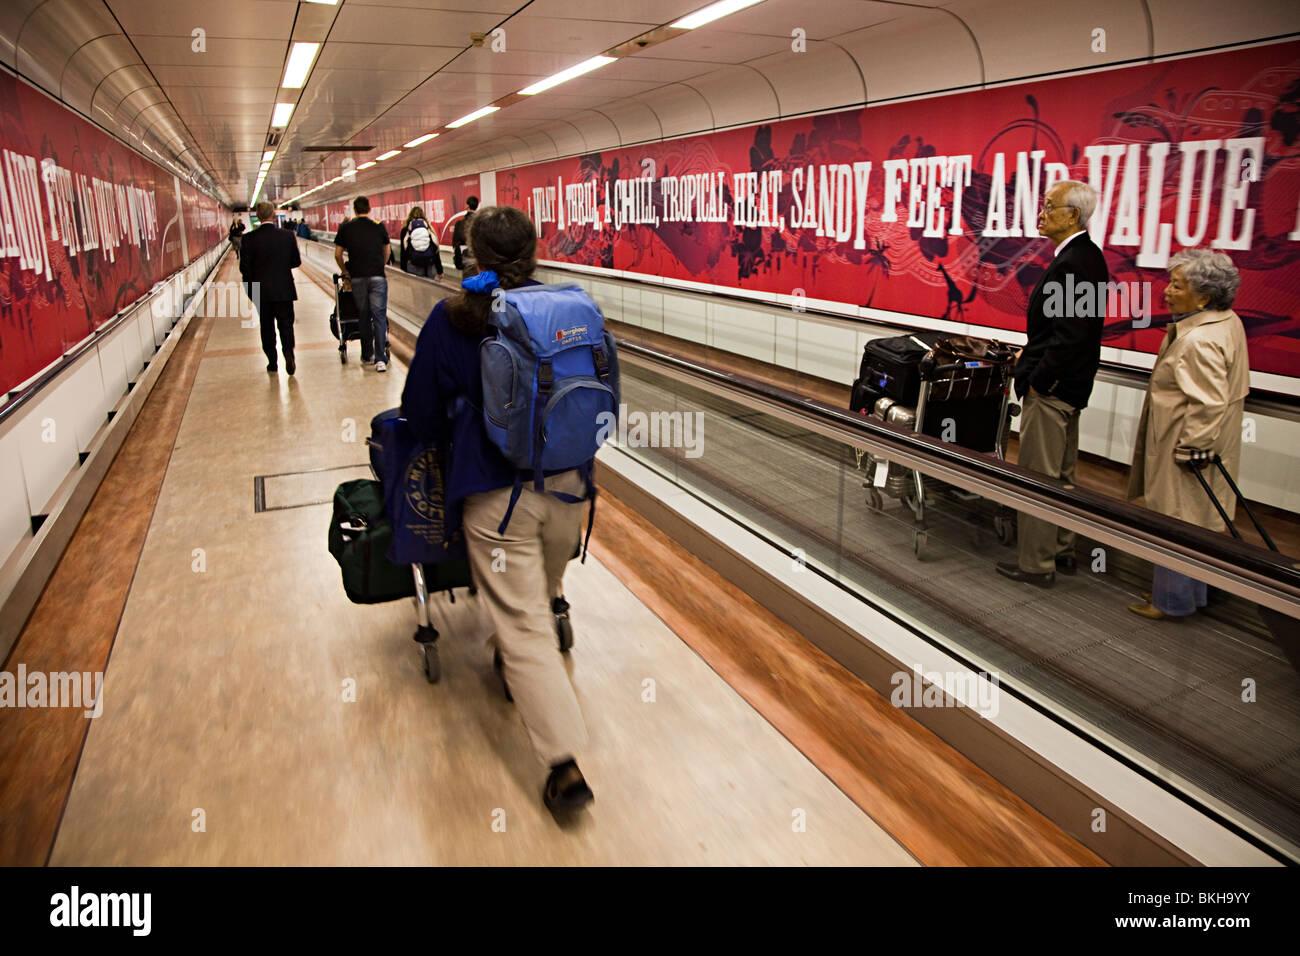 3f12bb3682baa Passenger pushing trolley with luggage through Gatwick airport London  England UK - Stock Image